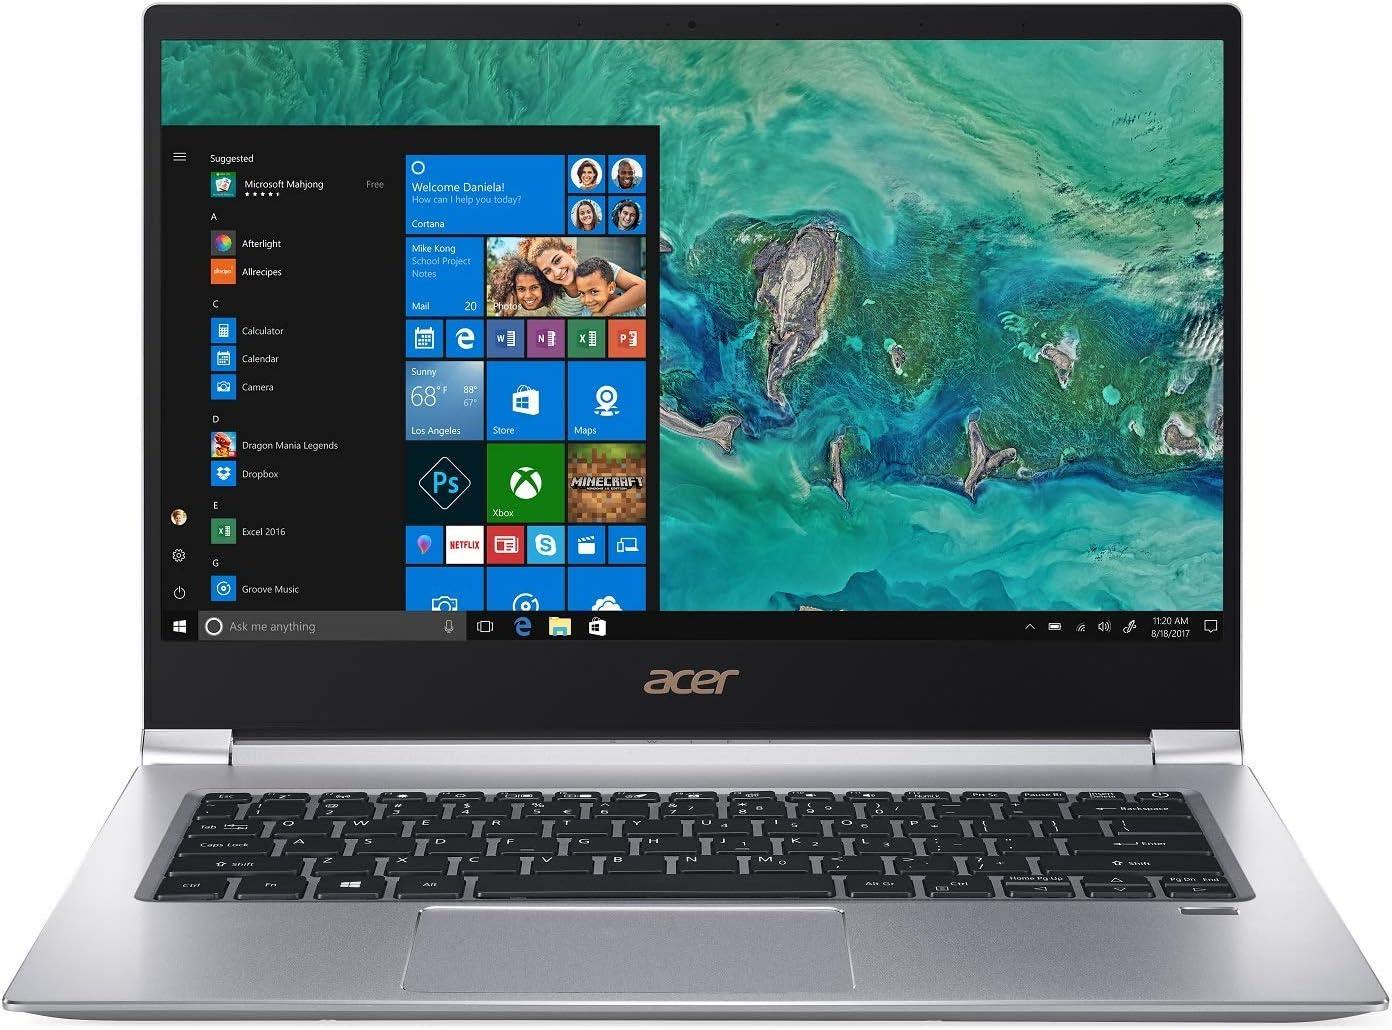 "Acer Swift 3 SF314-55G-78U1 Laptop, 8th Gen Intel Core i7-8565U, NVIDIA GeForce MX150, 14"" Full HD, 8GB DDR4, 256GB PCIe SSD, Gigabit WiFi, Back-lit Keyboard, Windows 10 (Renewed)"